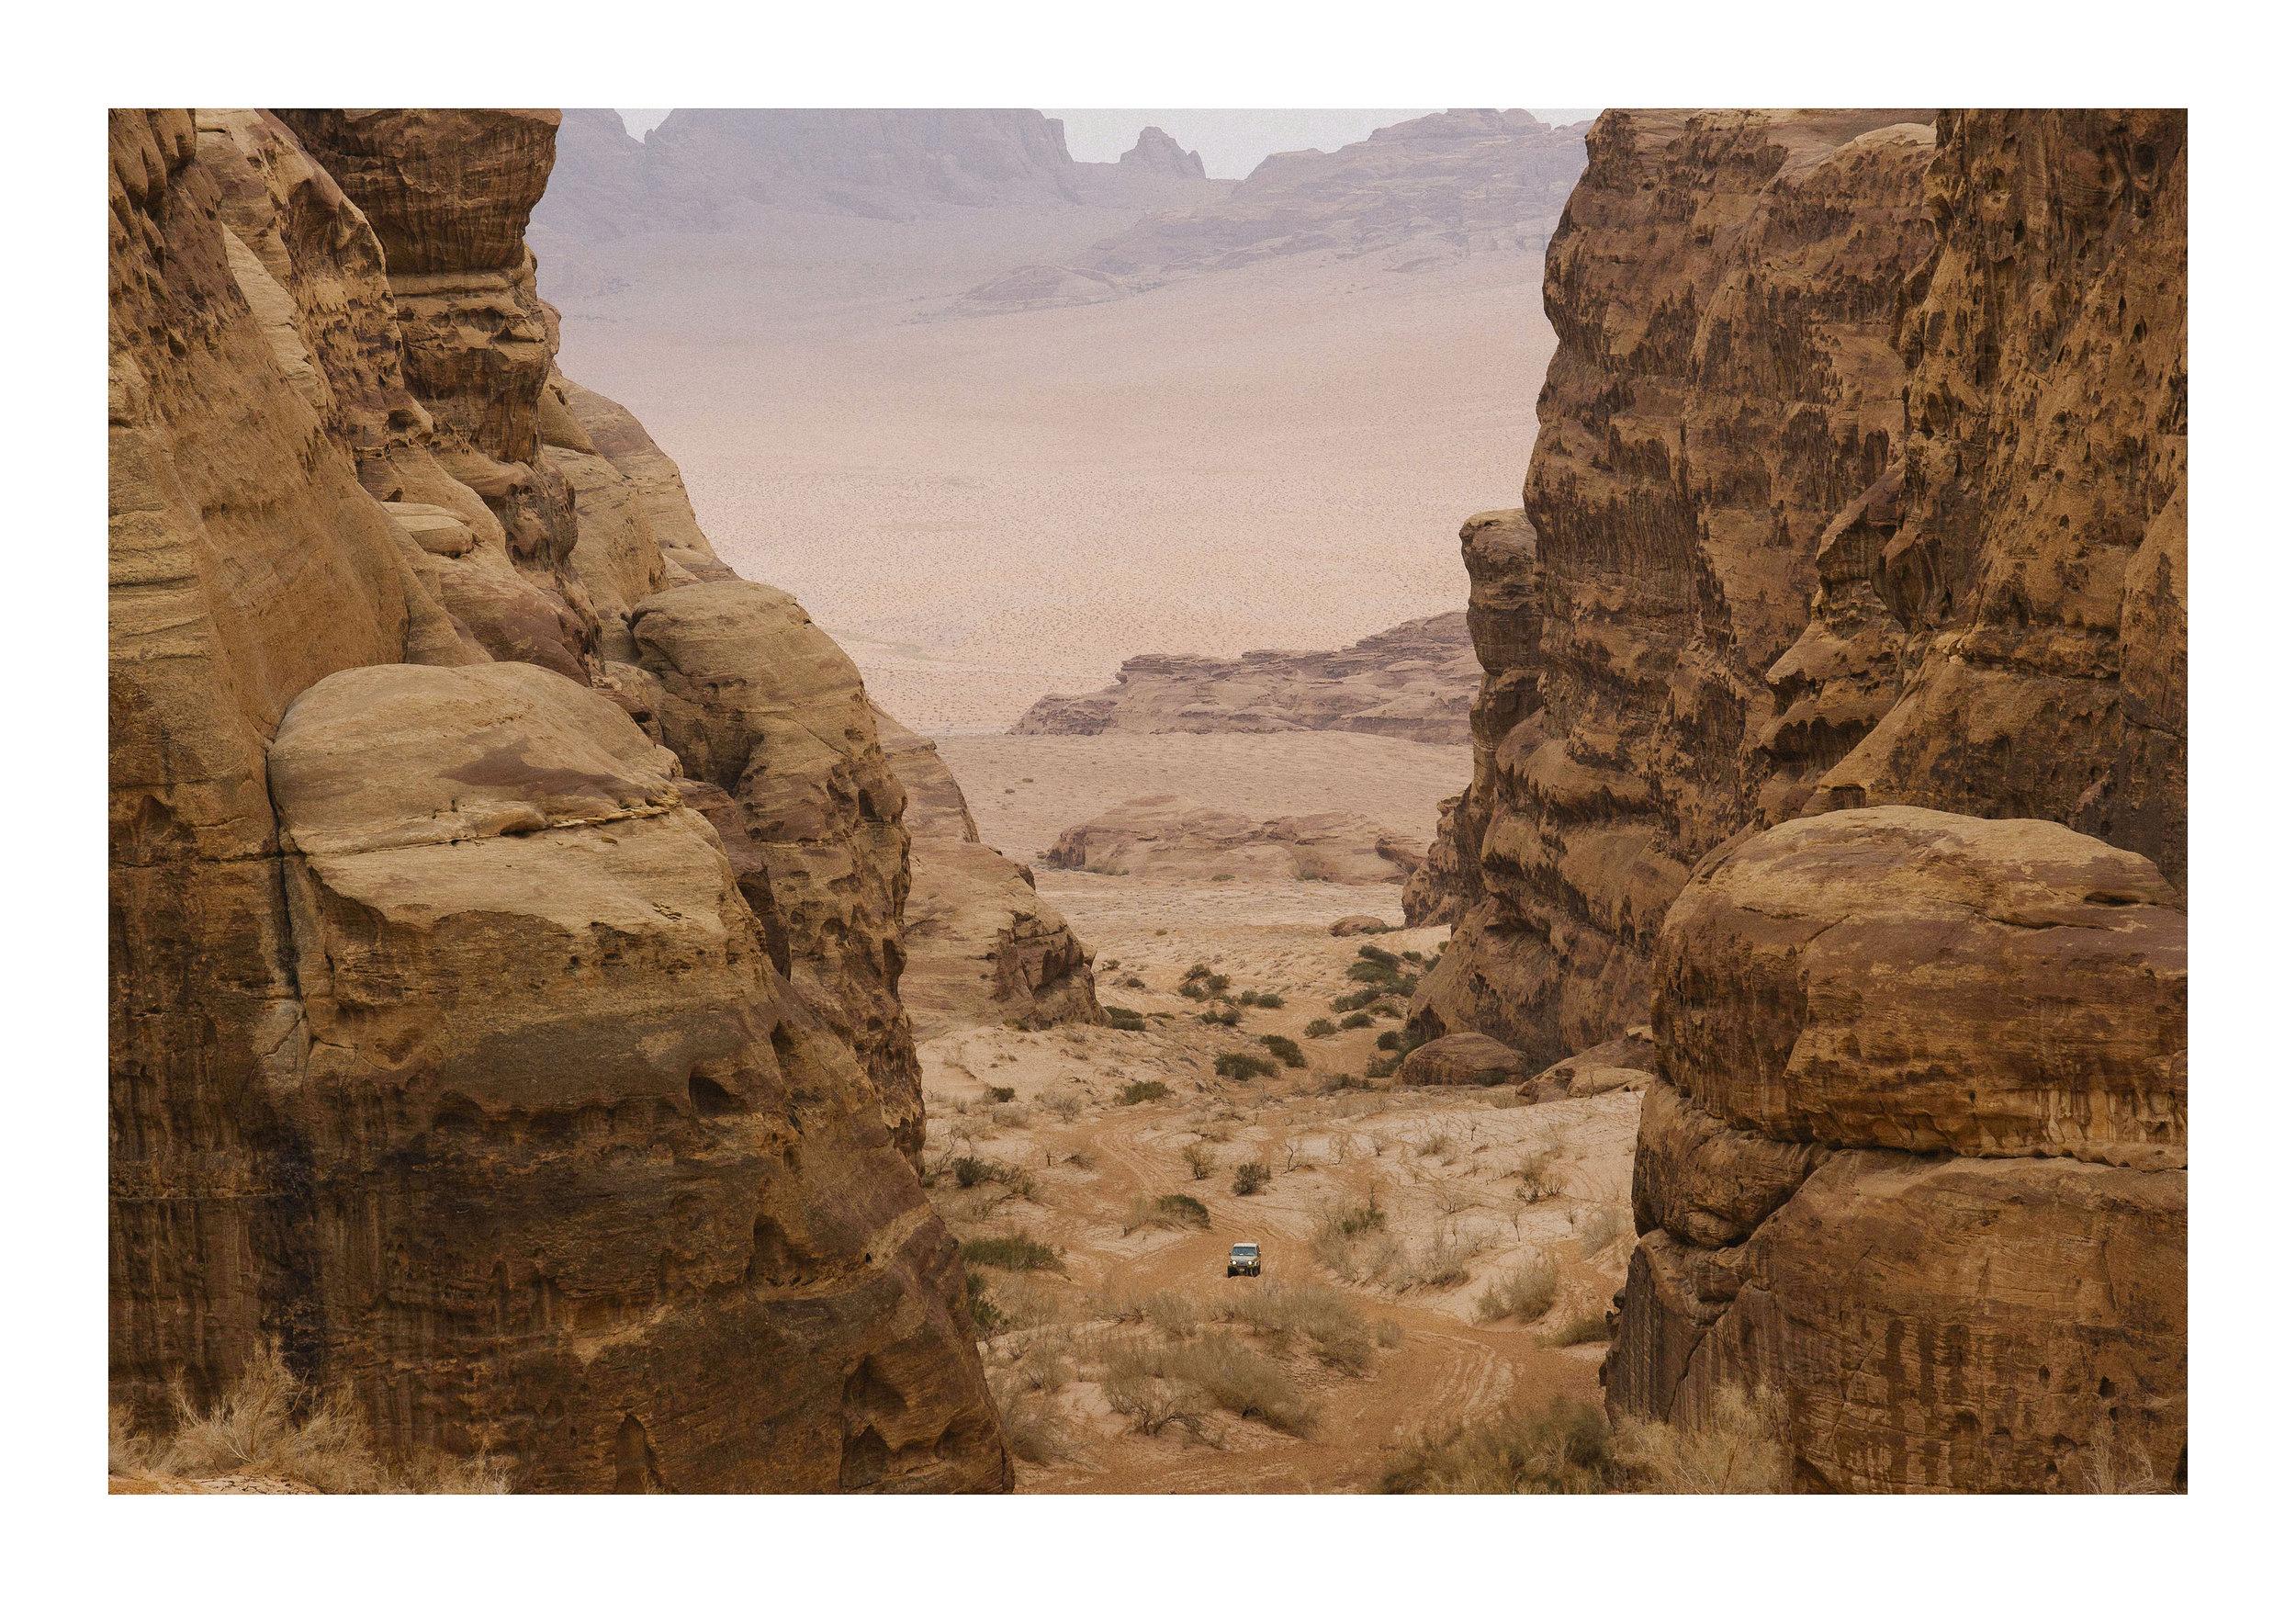 26 1902 JOR Wadi Rum 0459.JPG